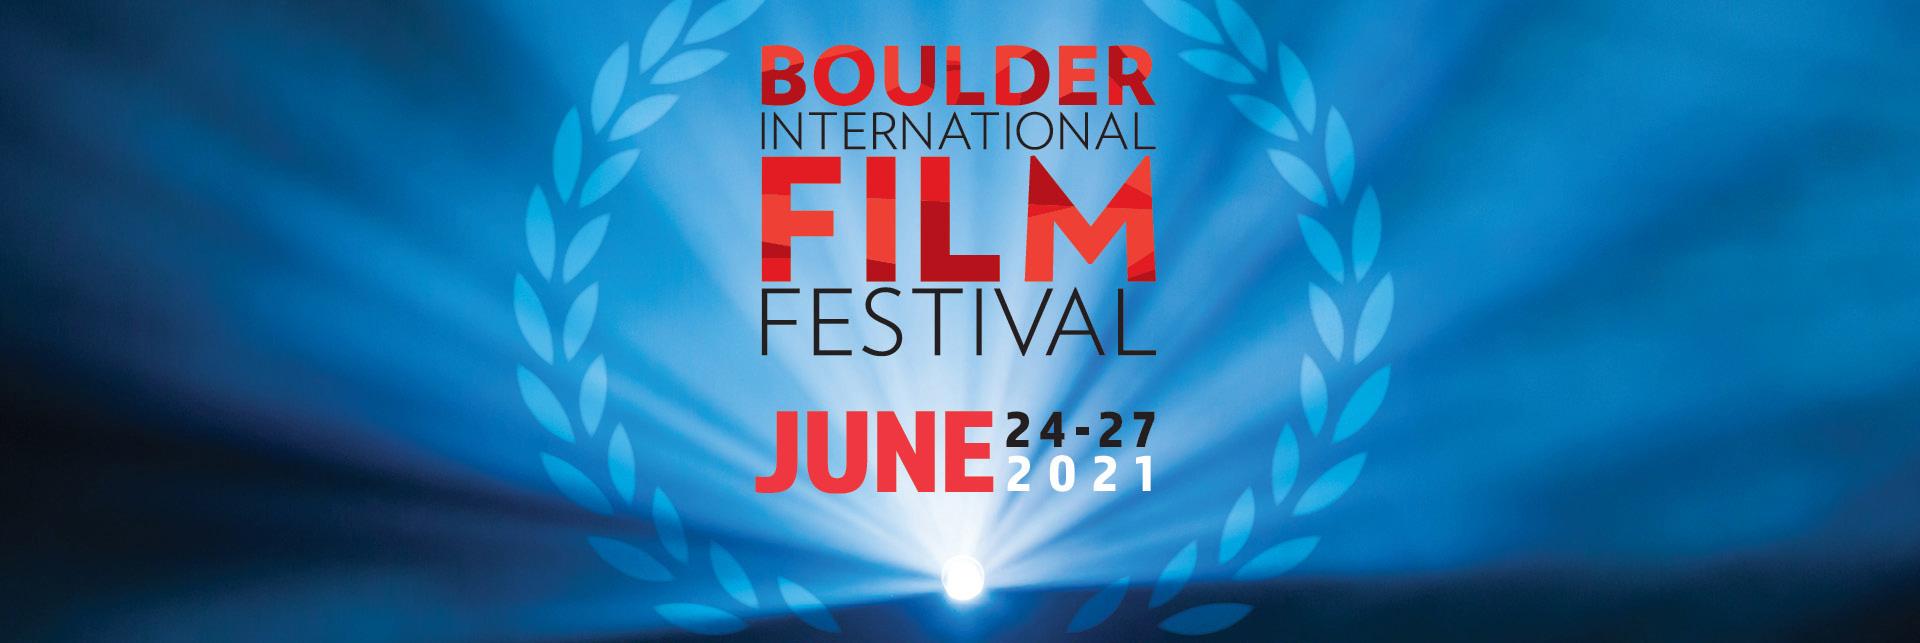 2021 Boulder International Film Festival